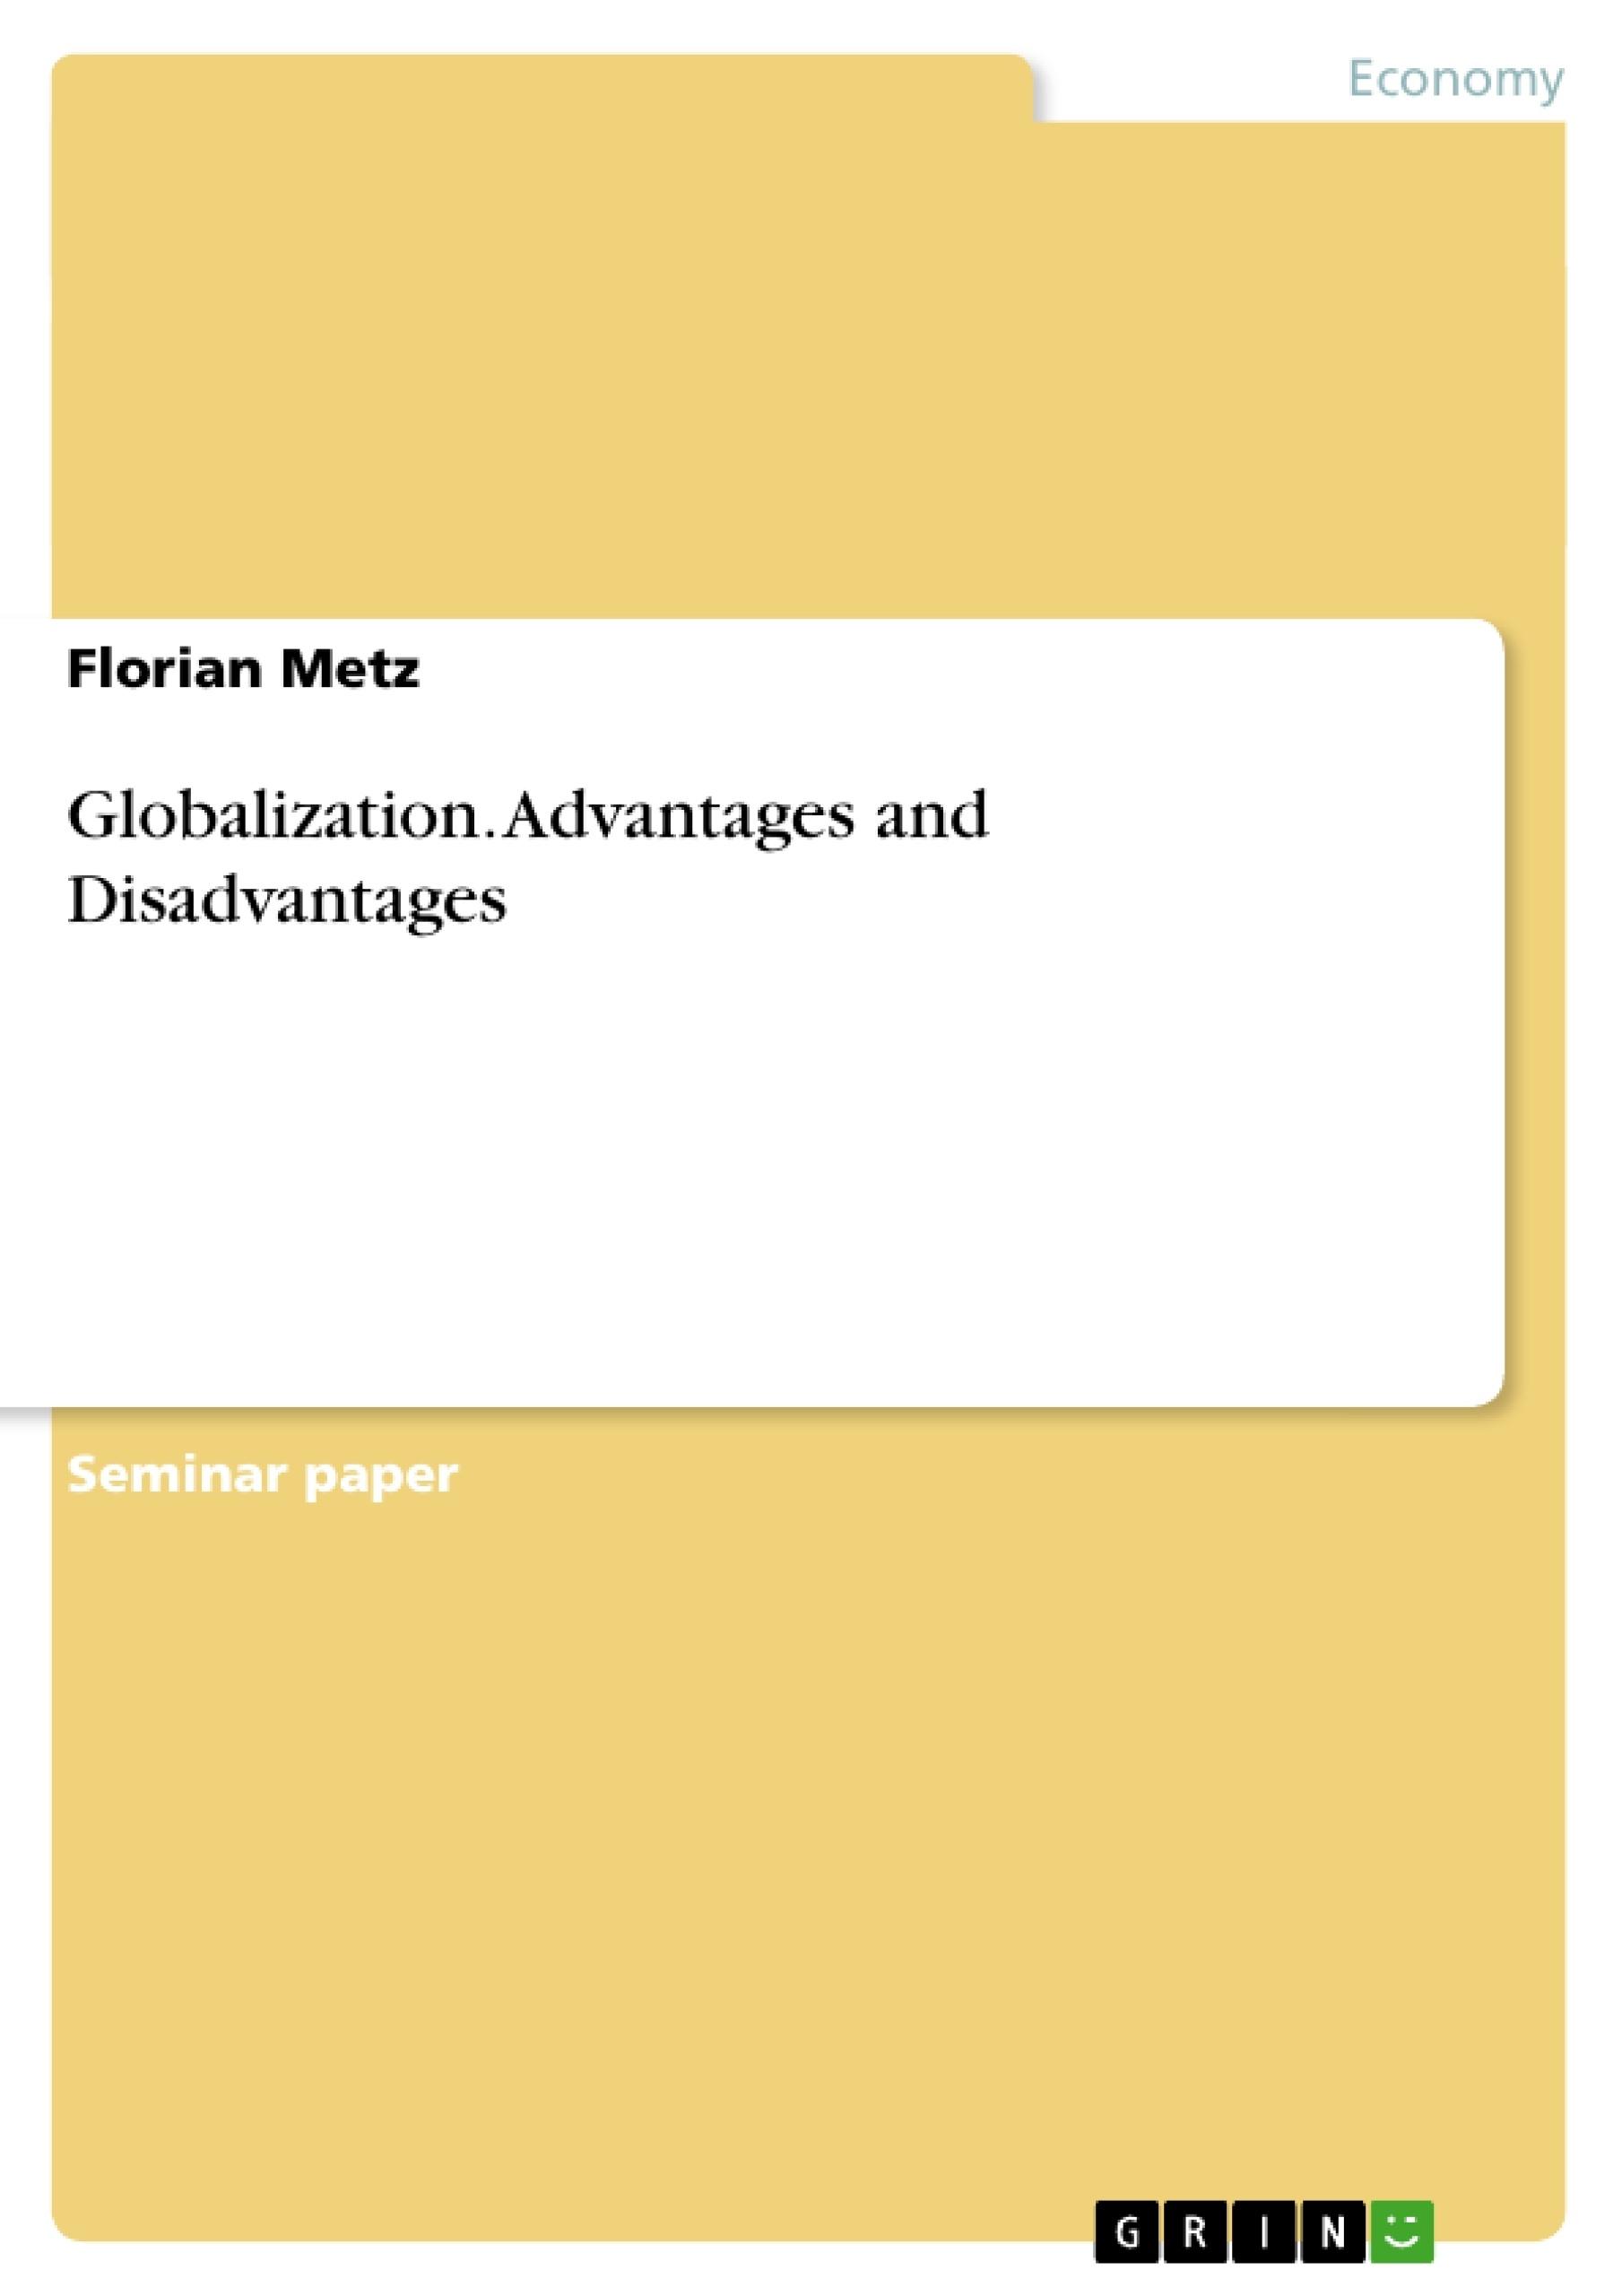 Title: Globalization. Advantages and Disadvantages